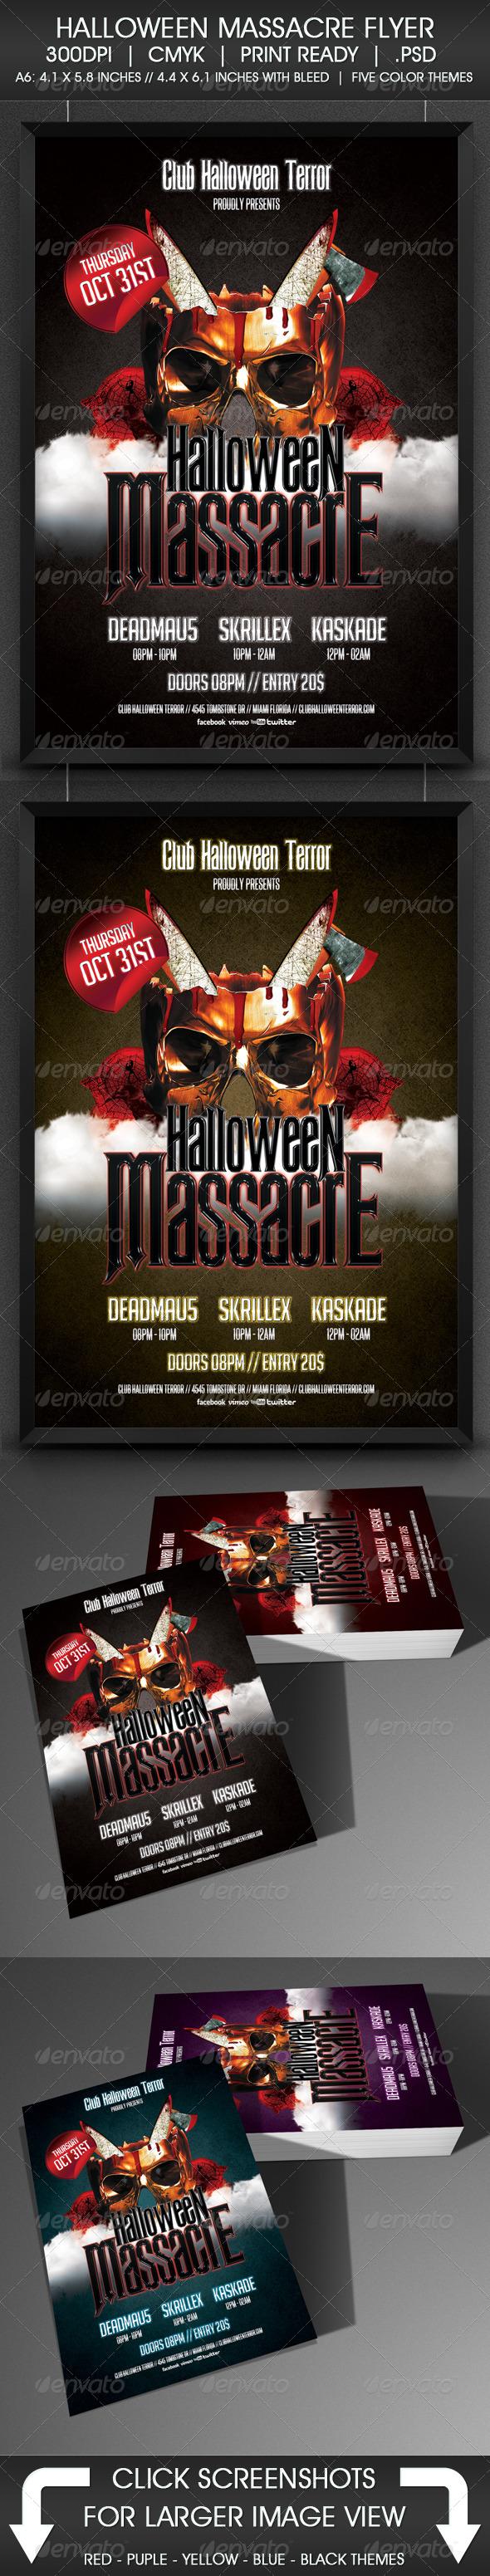 GraphicRiver Halloween Massacre Flyer 5540454